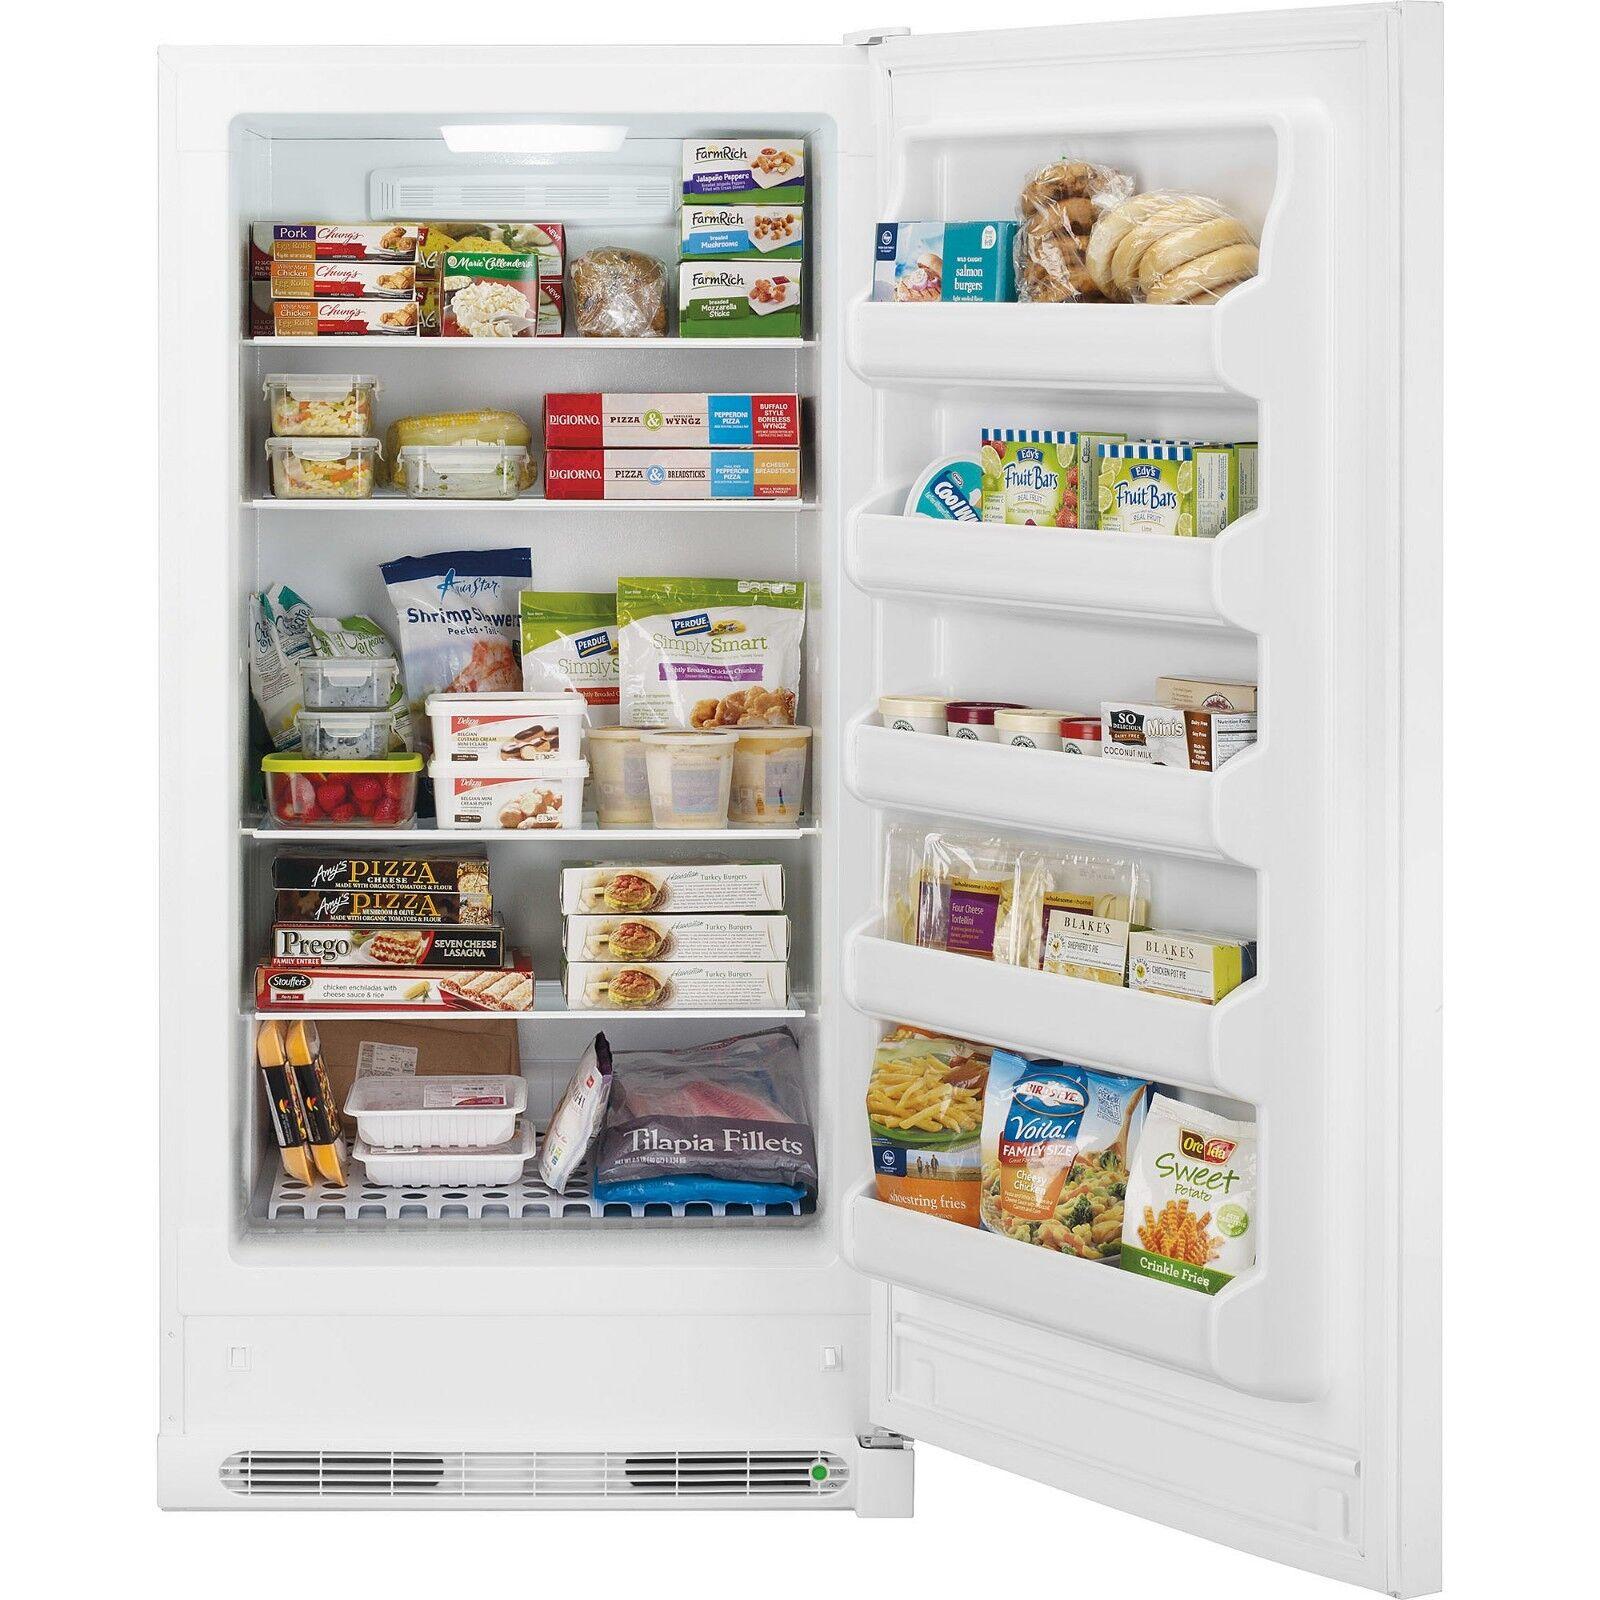 16.6 Cubic Foot Kenmore Freezerless Refrigerator